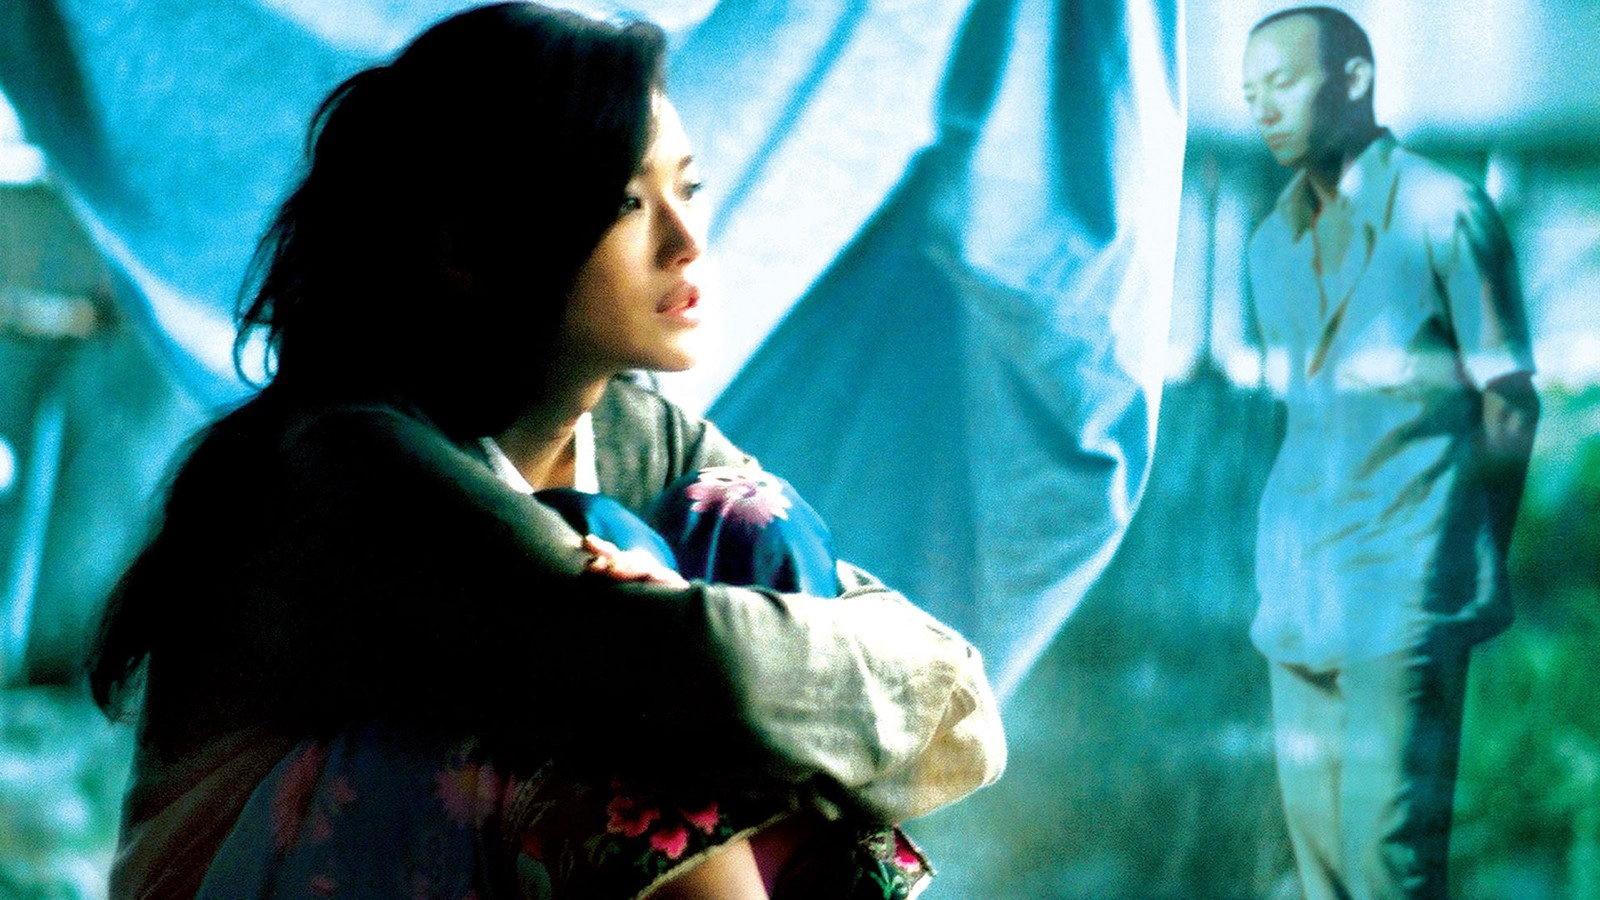 Suzhou River Trailer